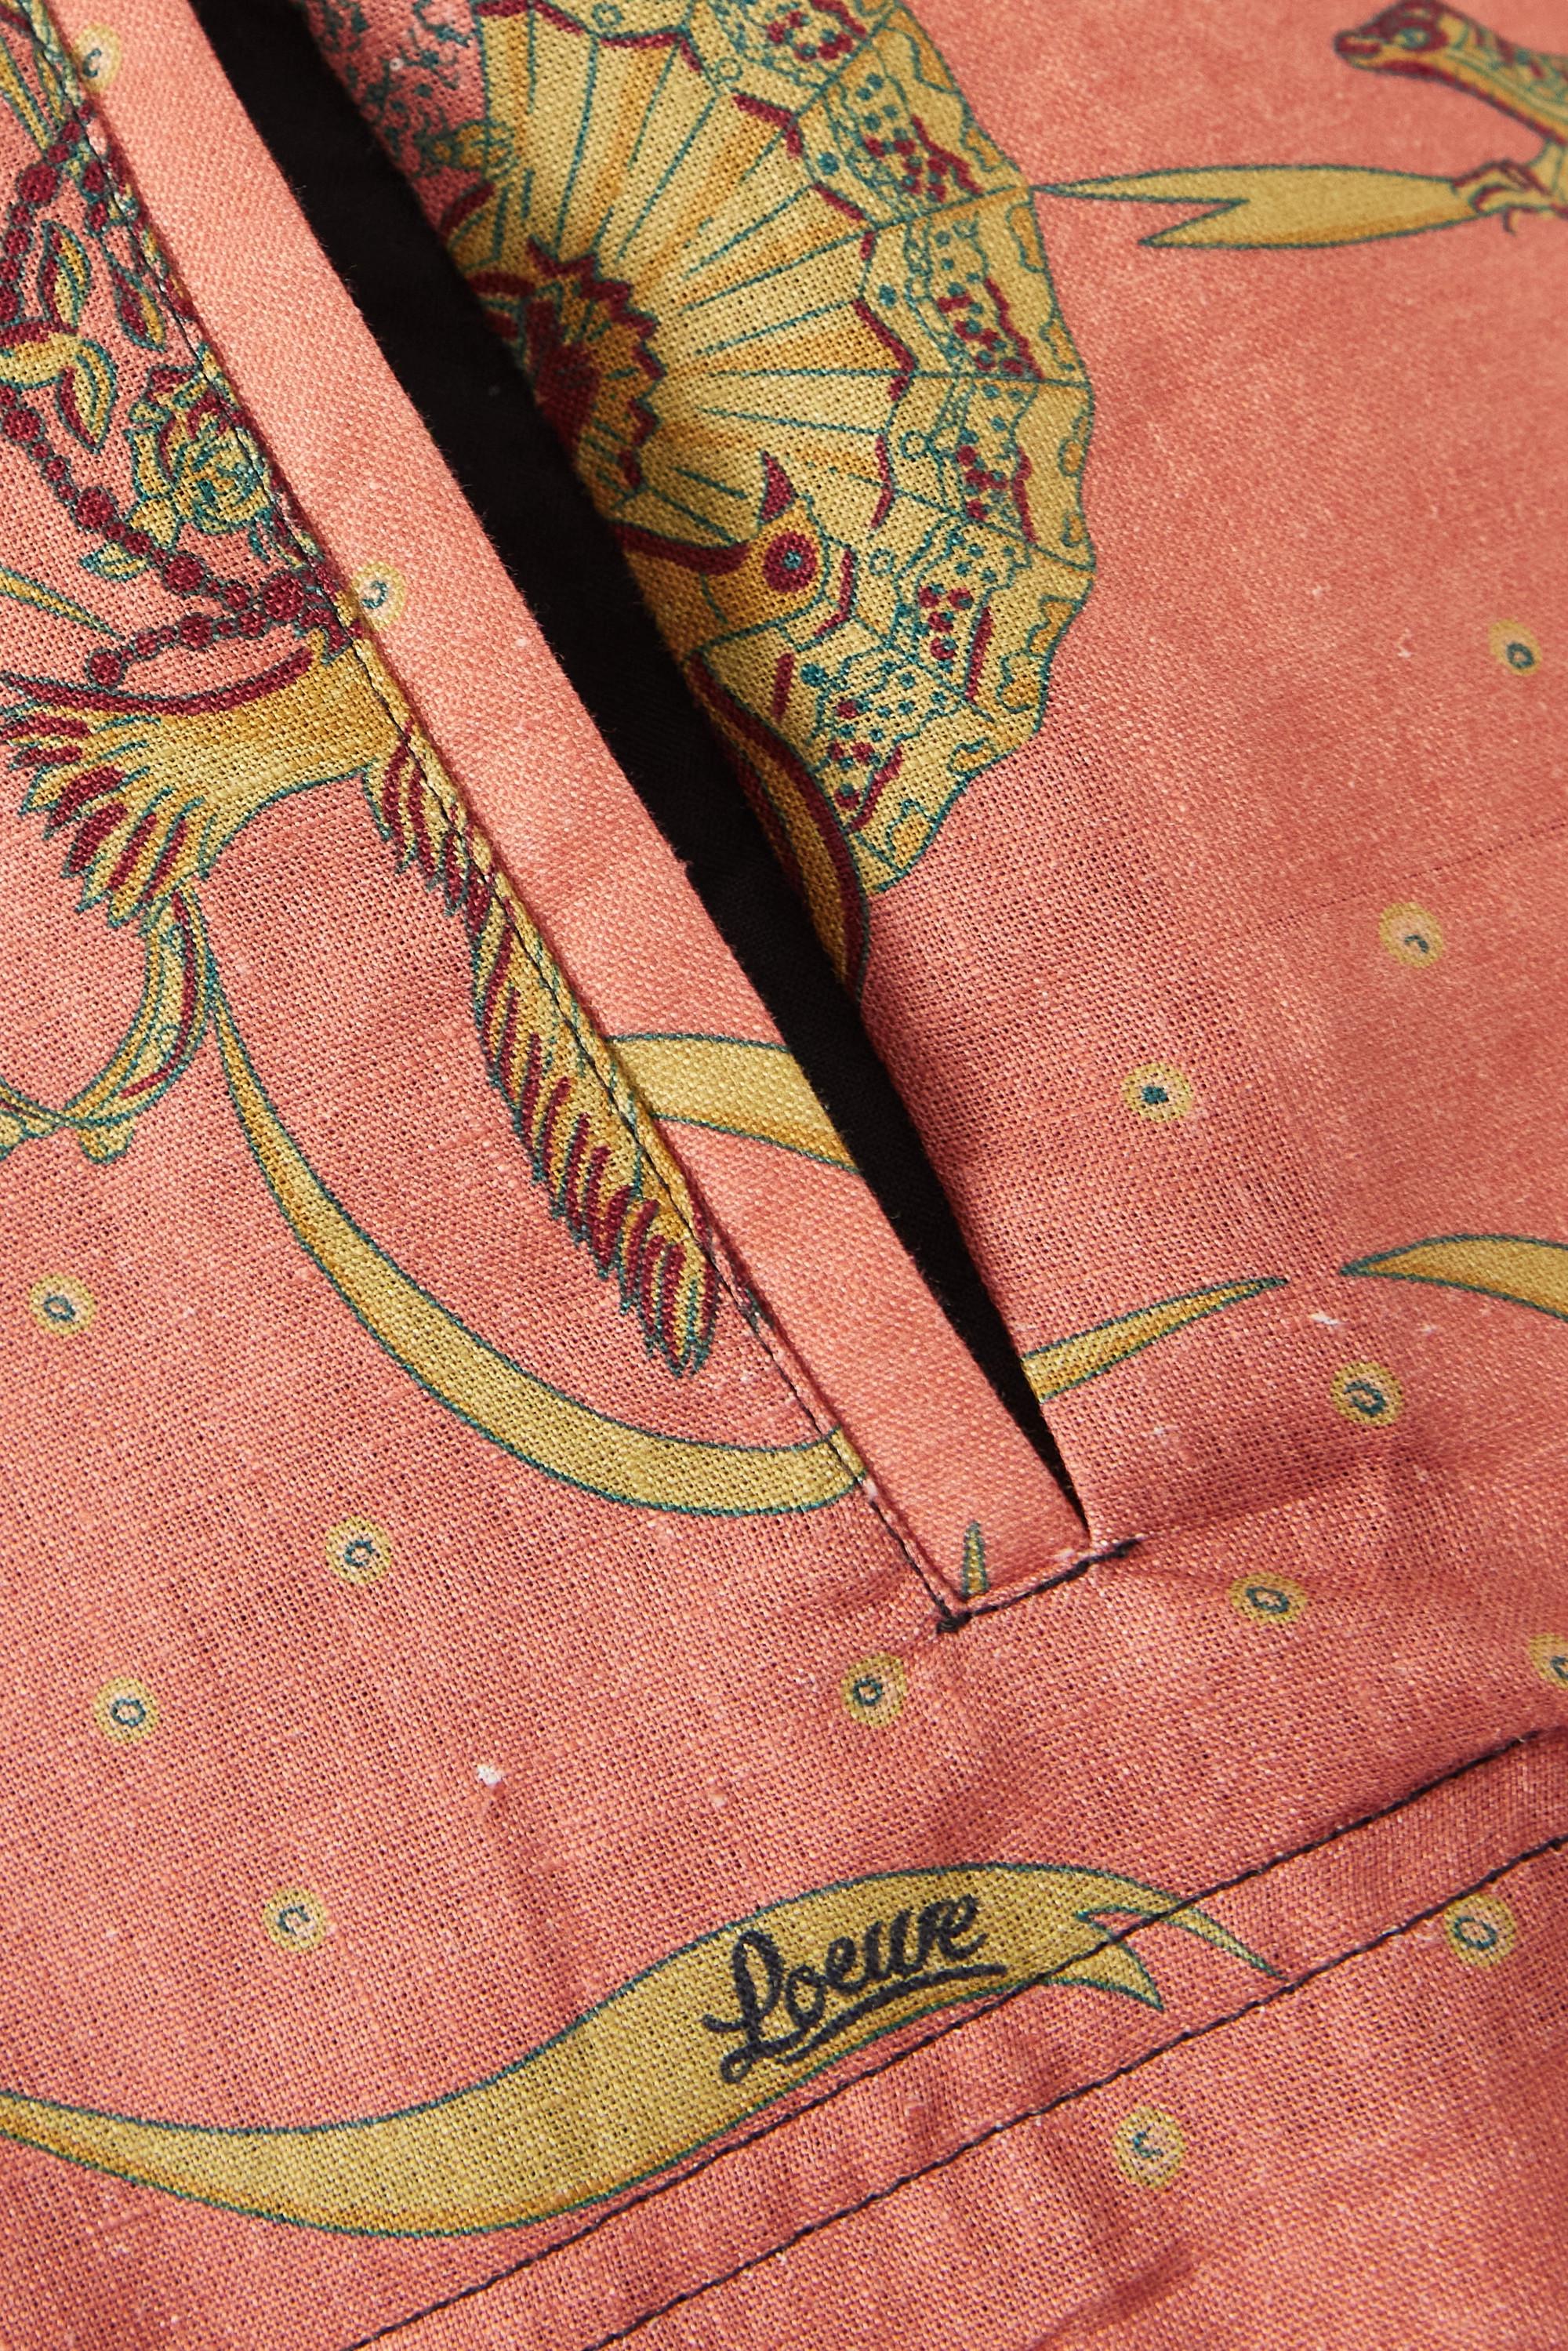 Loewe + Paula's Ibiza belted printed linen and cotton-blend wide-leg pants